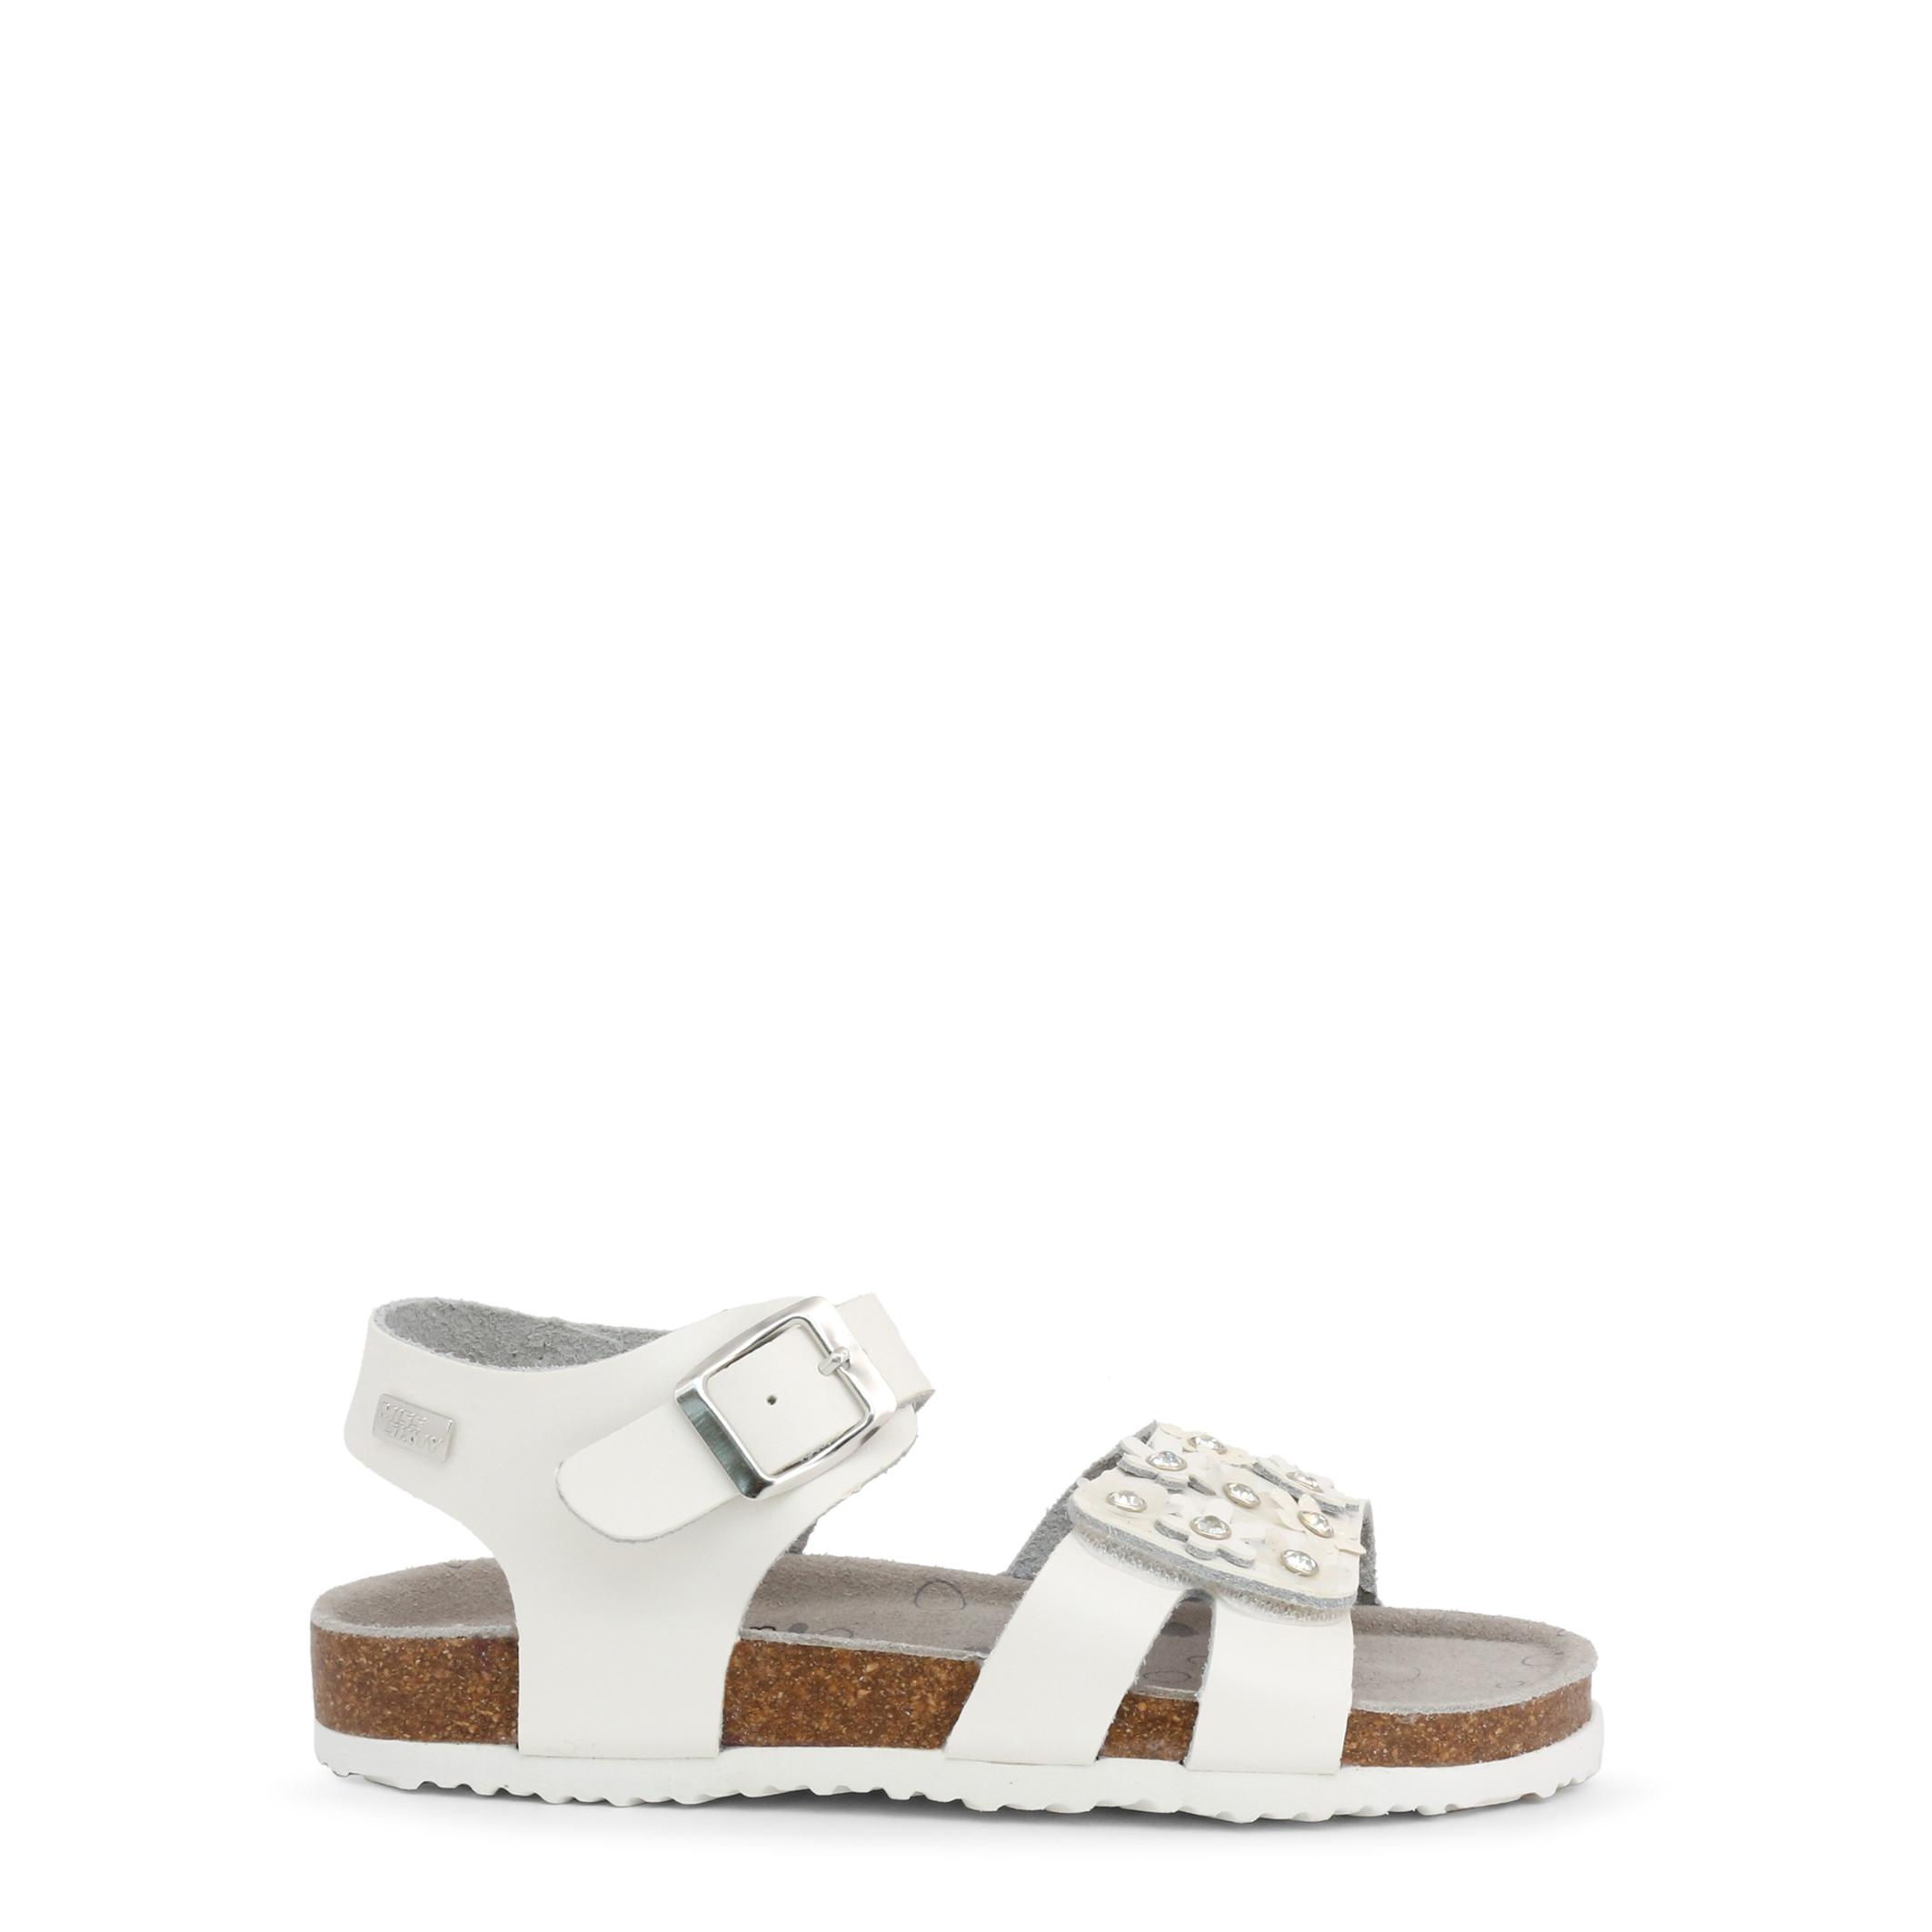 Sandale Miss Sixty MS795 Alb